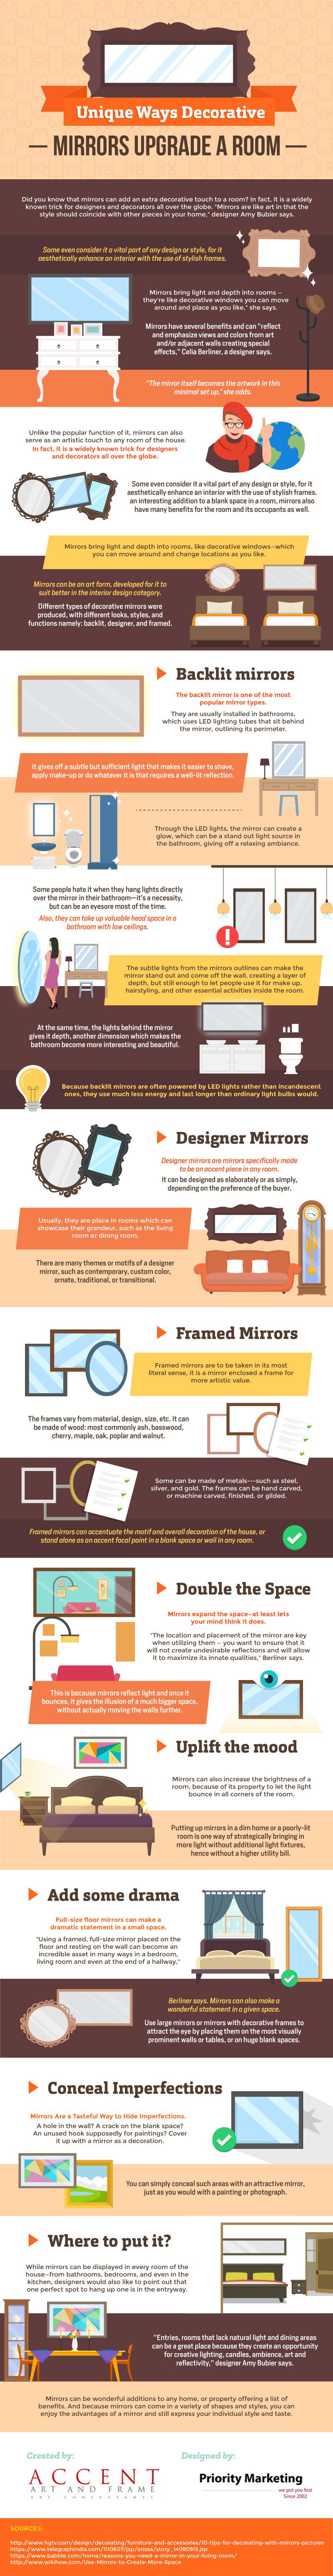 Unique Ways Decorative Mirrors Upgrade a Room [Infographic]